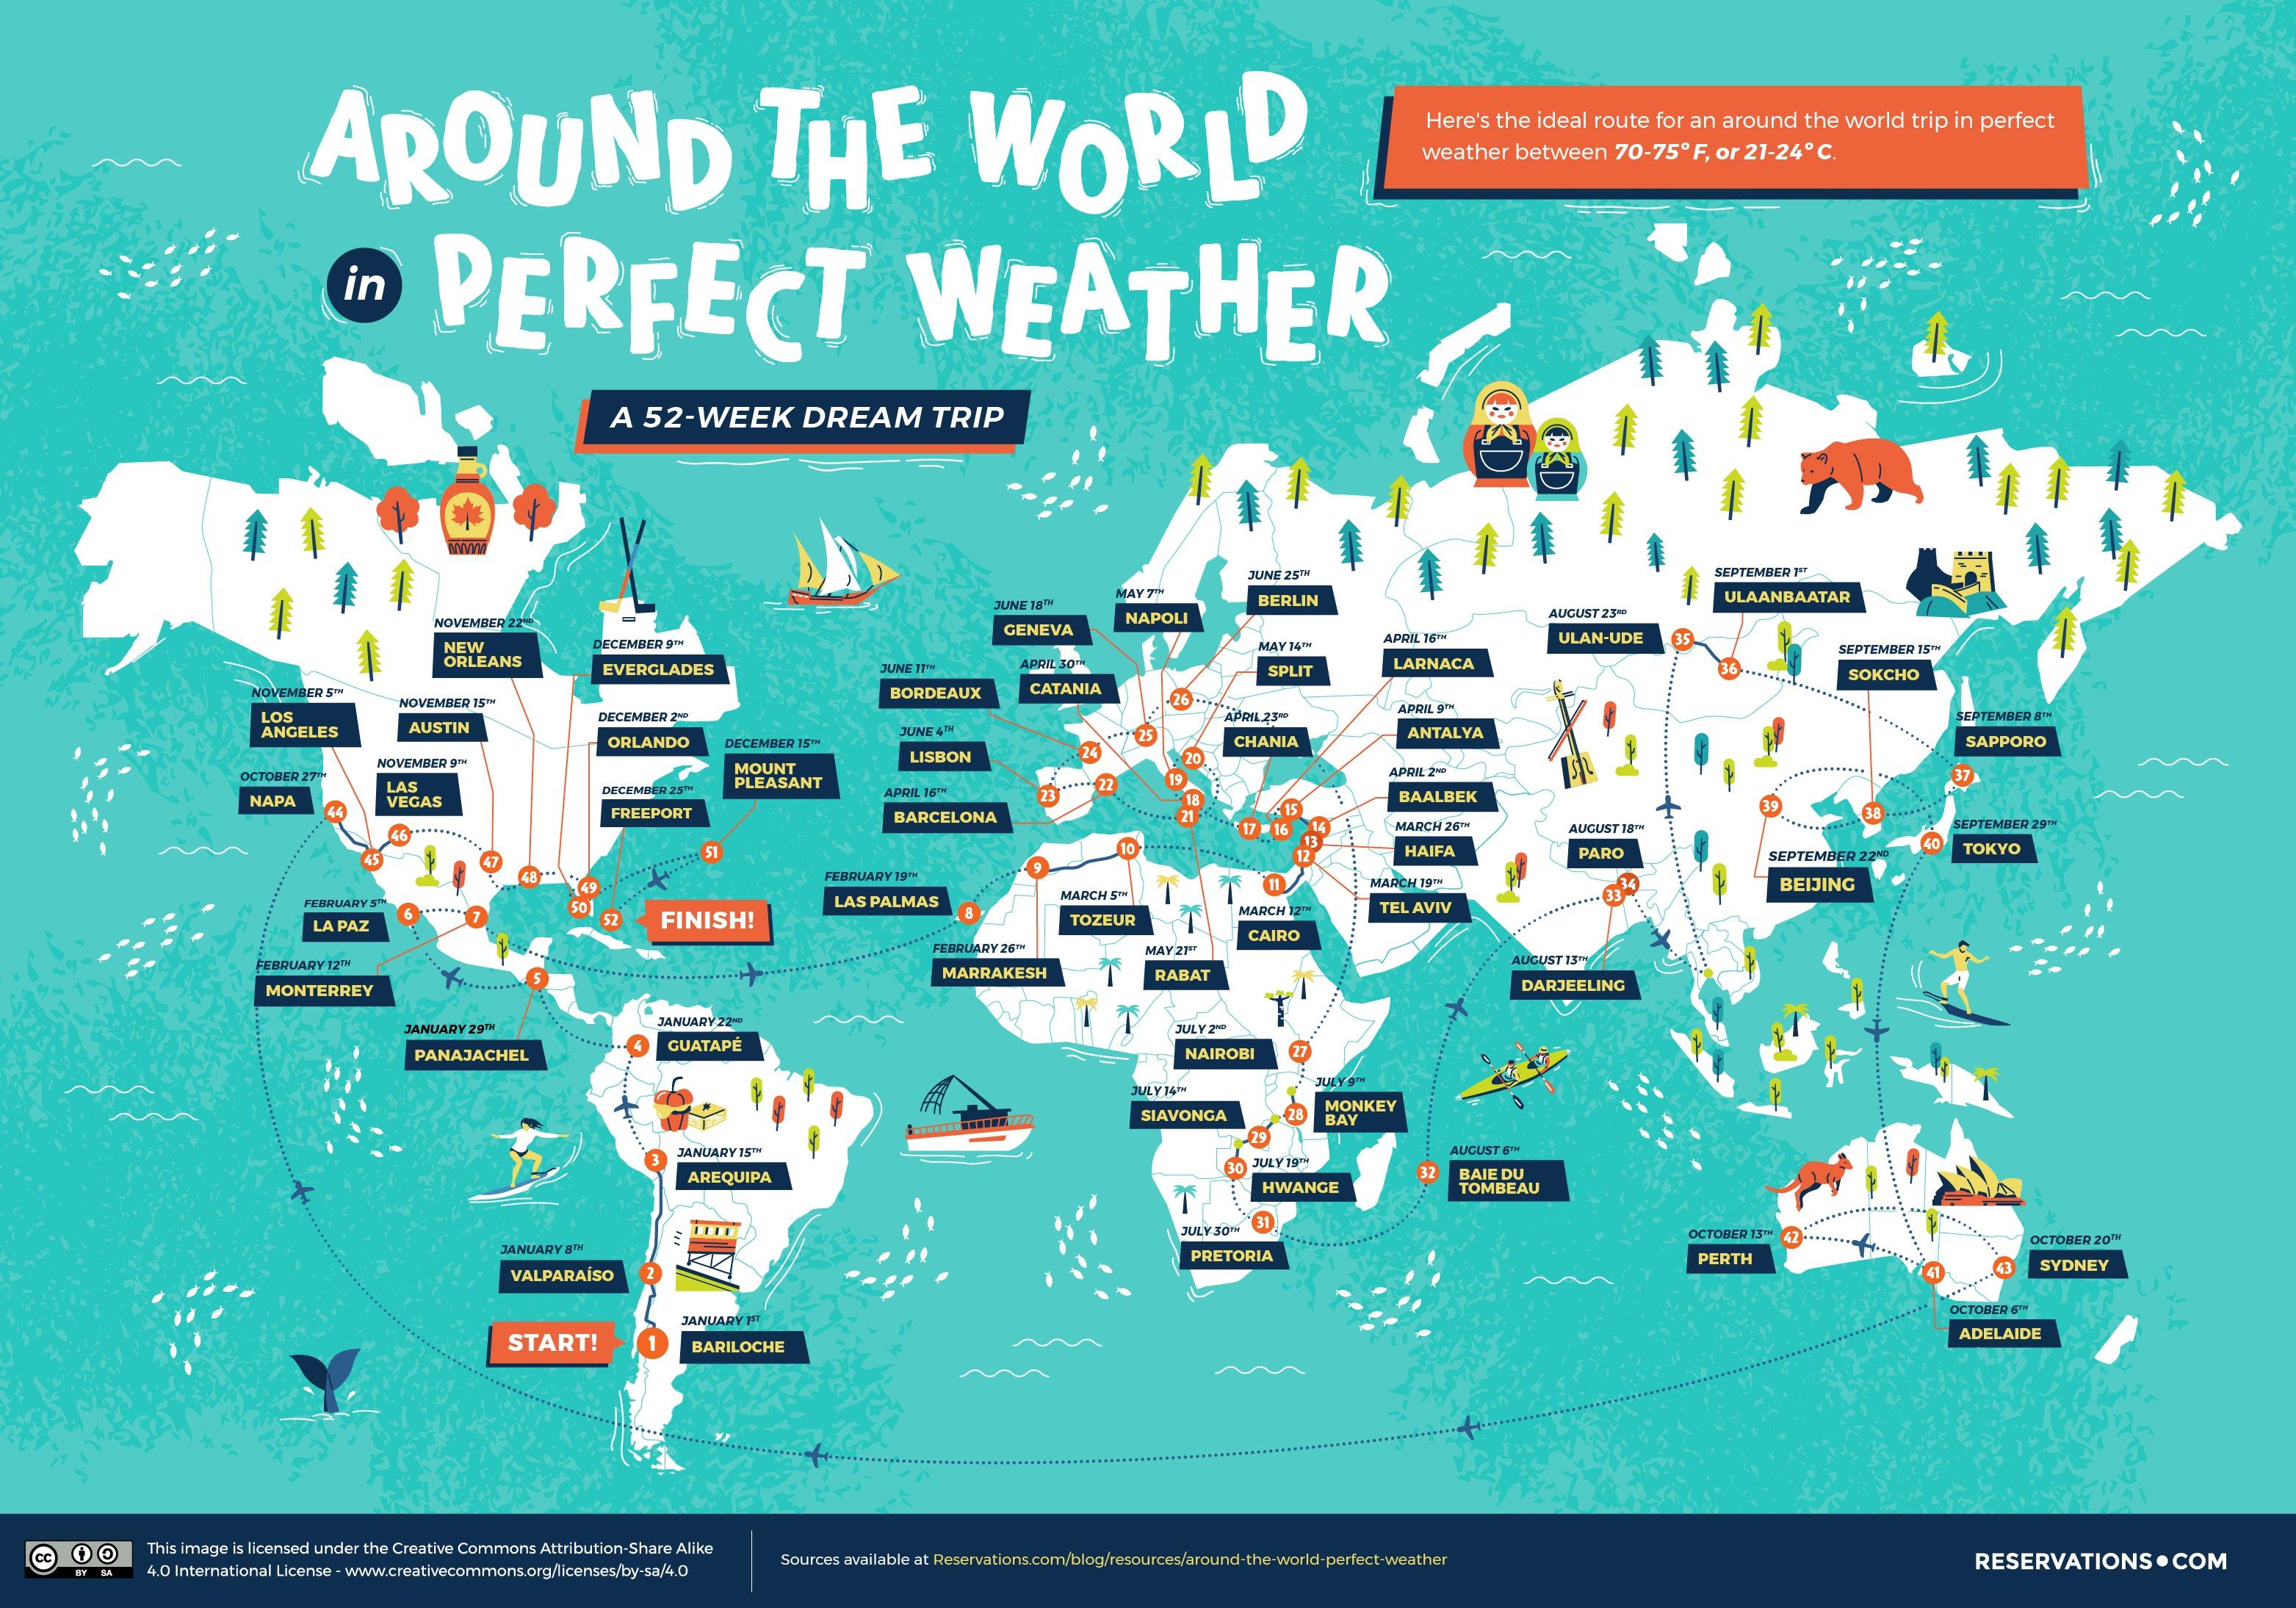 around the world perfect weather